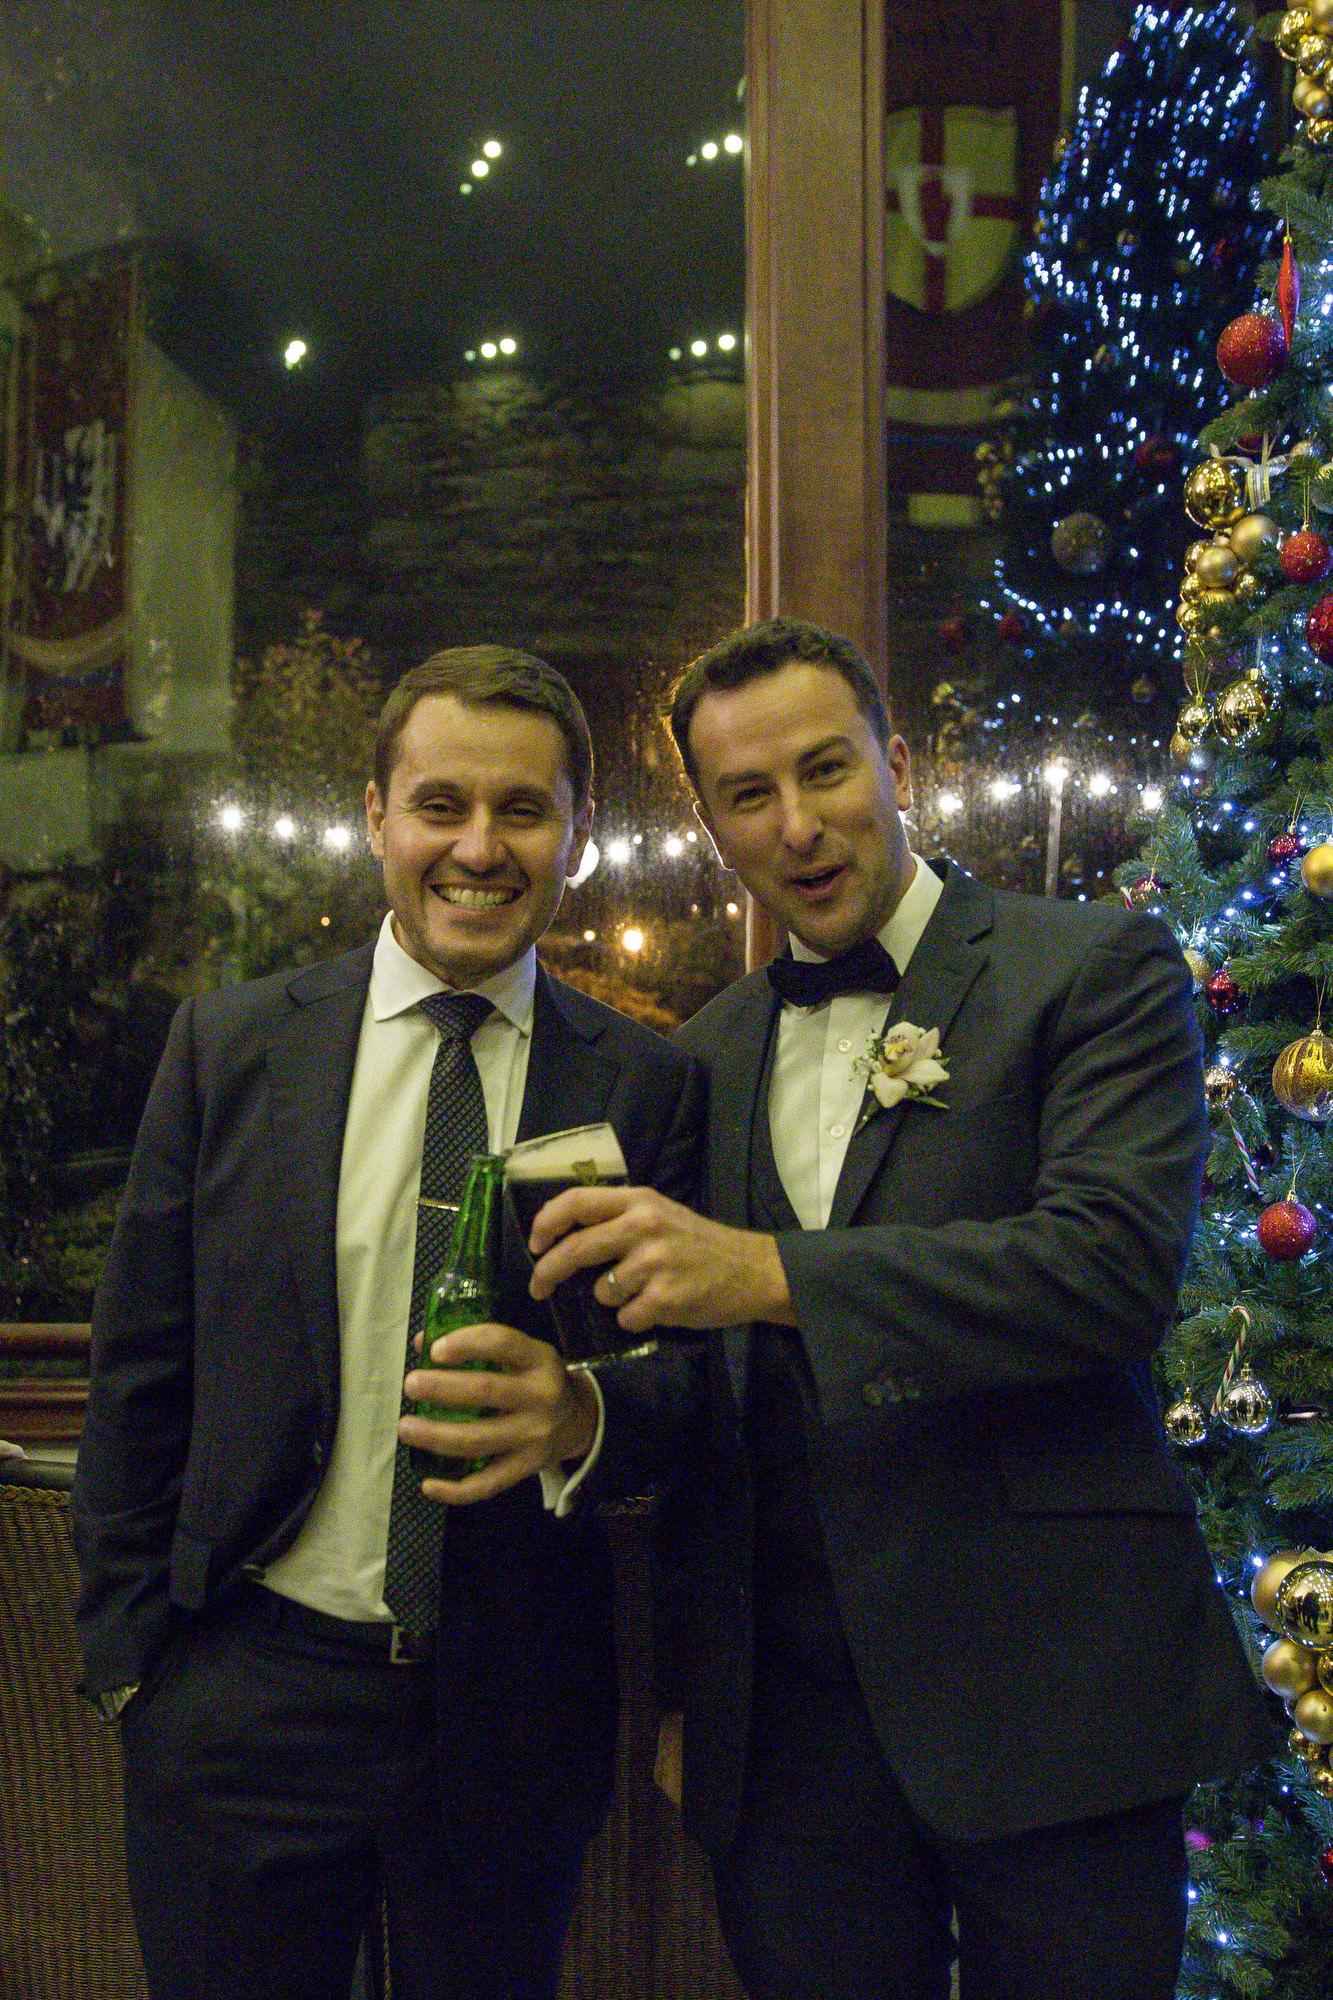 muckross_park_hotel_grougane_barra_wedding_photographer_goldenmoments_064.jpg